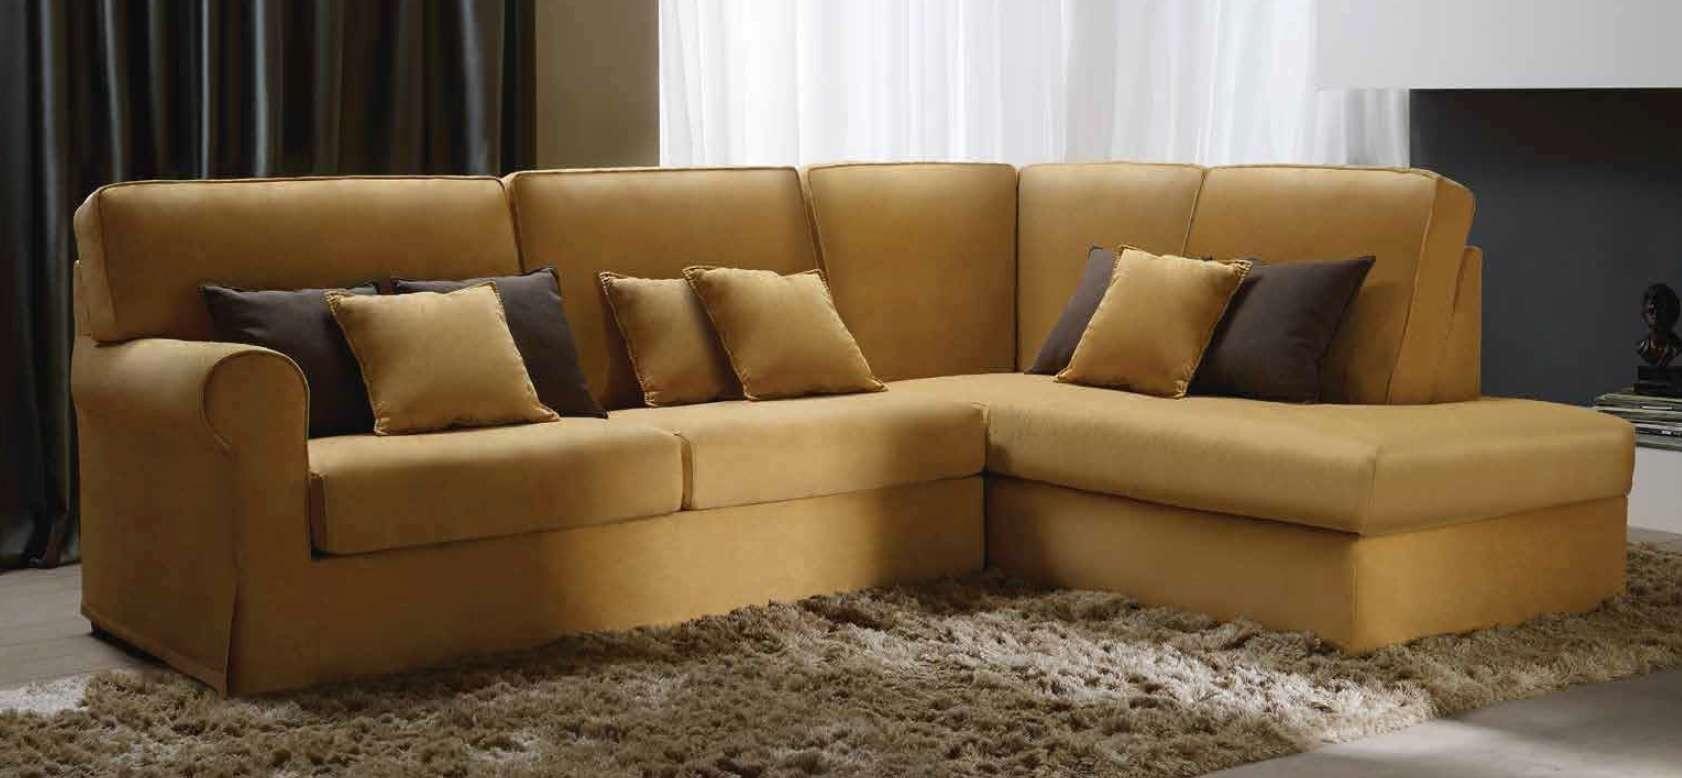 divano donatello